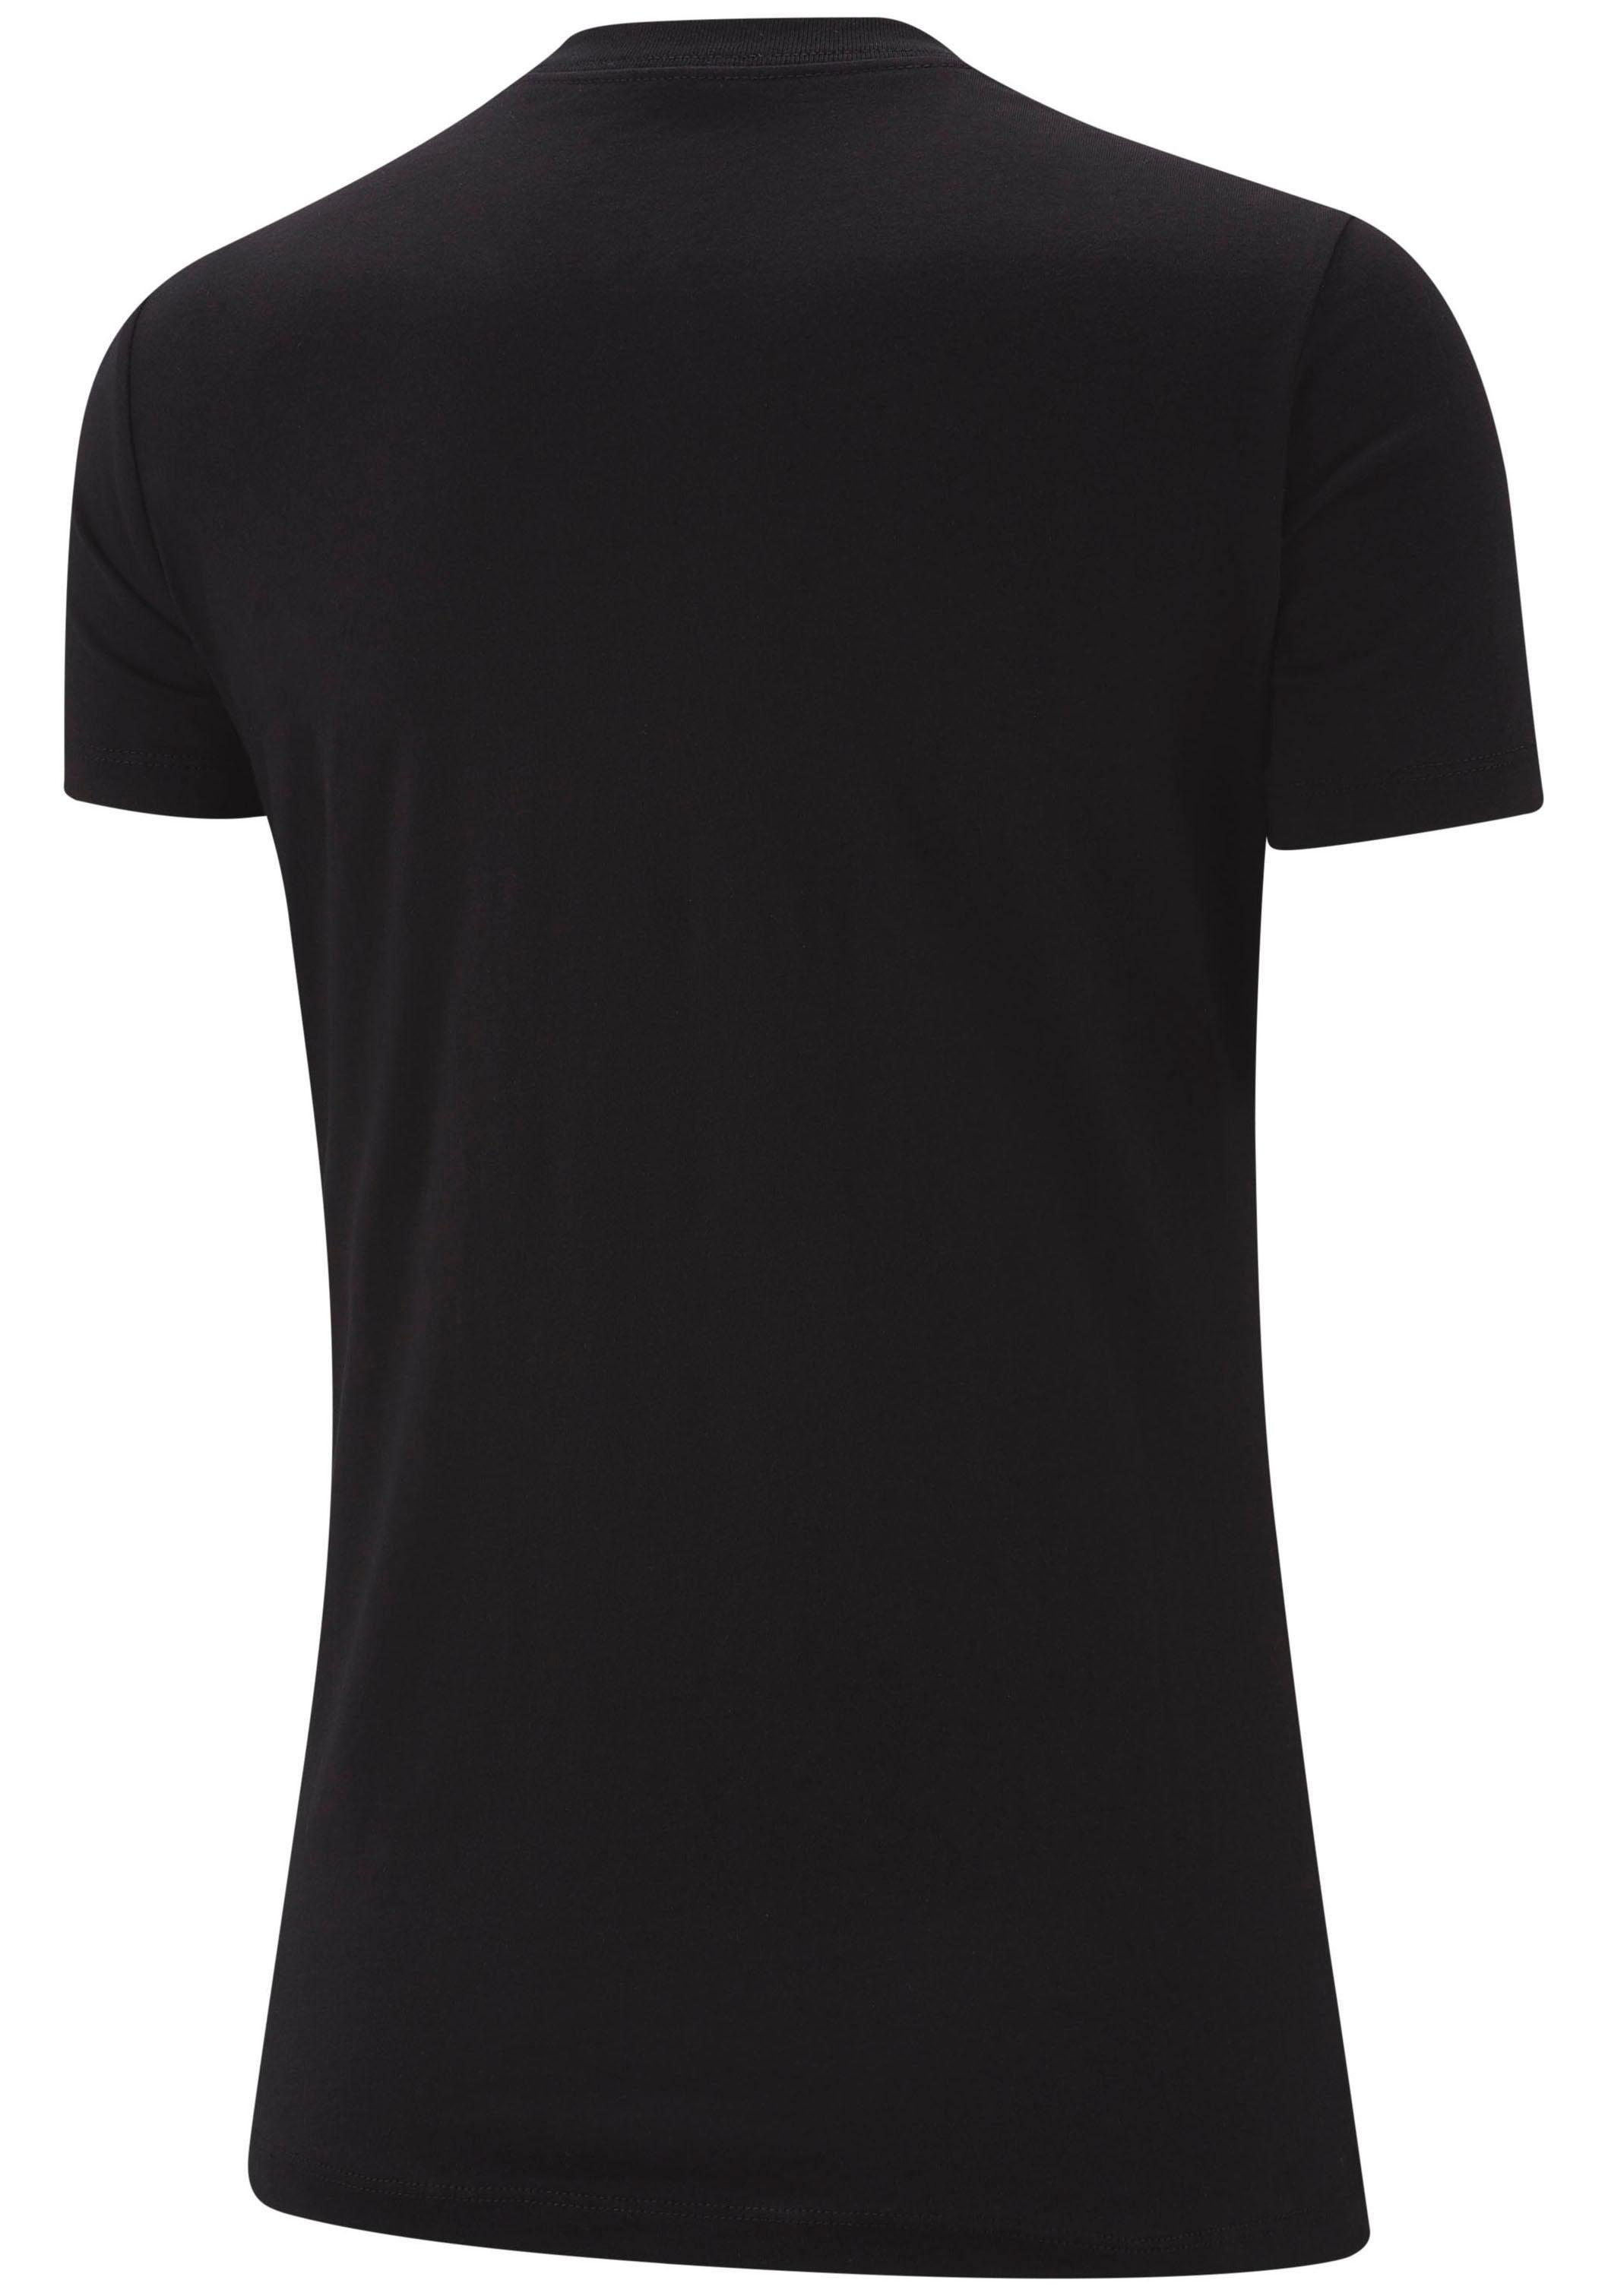 Futura« T Icon Sportswear Tee Kaufen Nsw Online »w shirt Nike Essntl nvwONm80